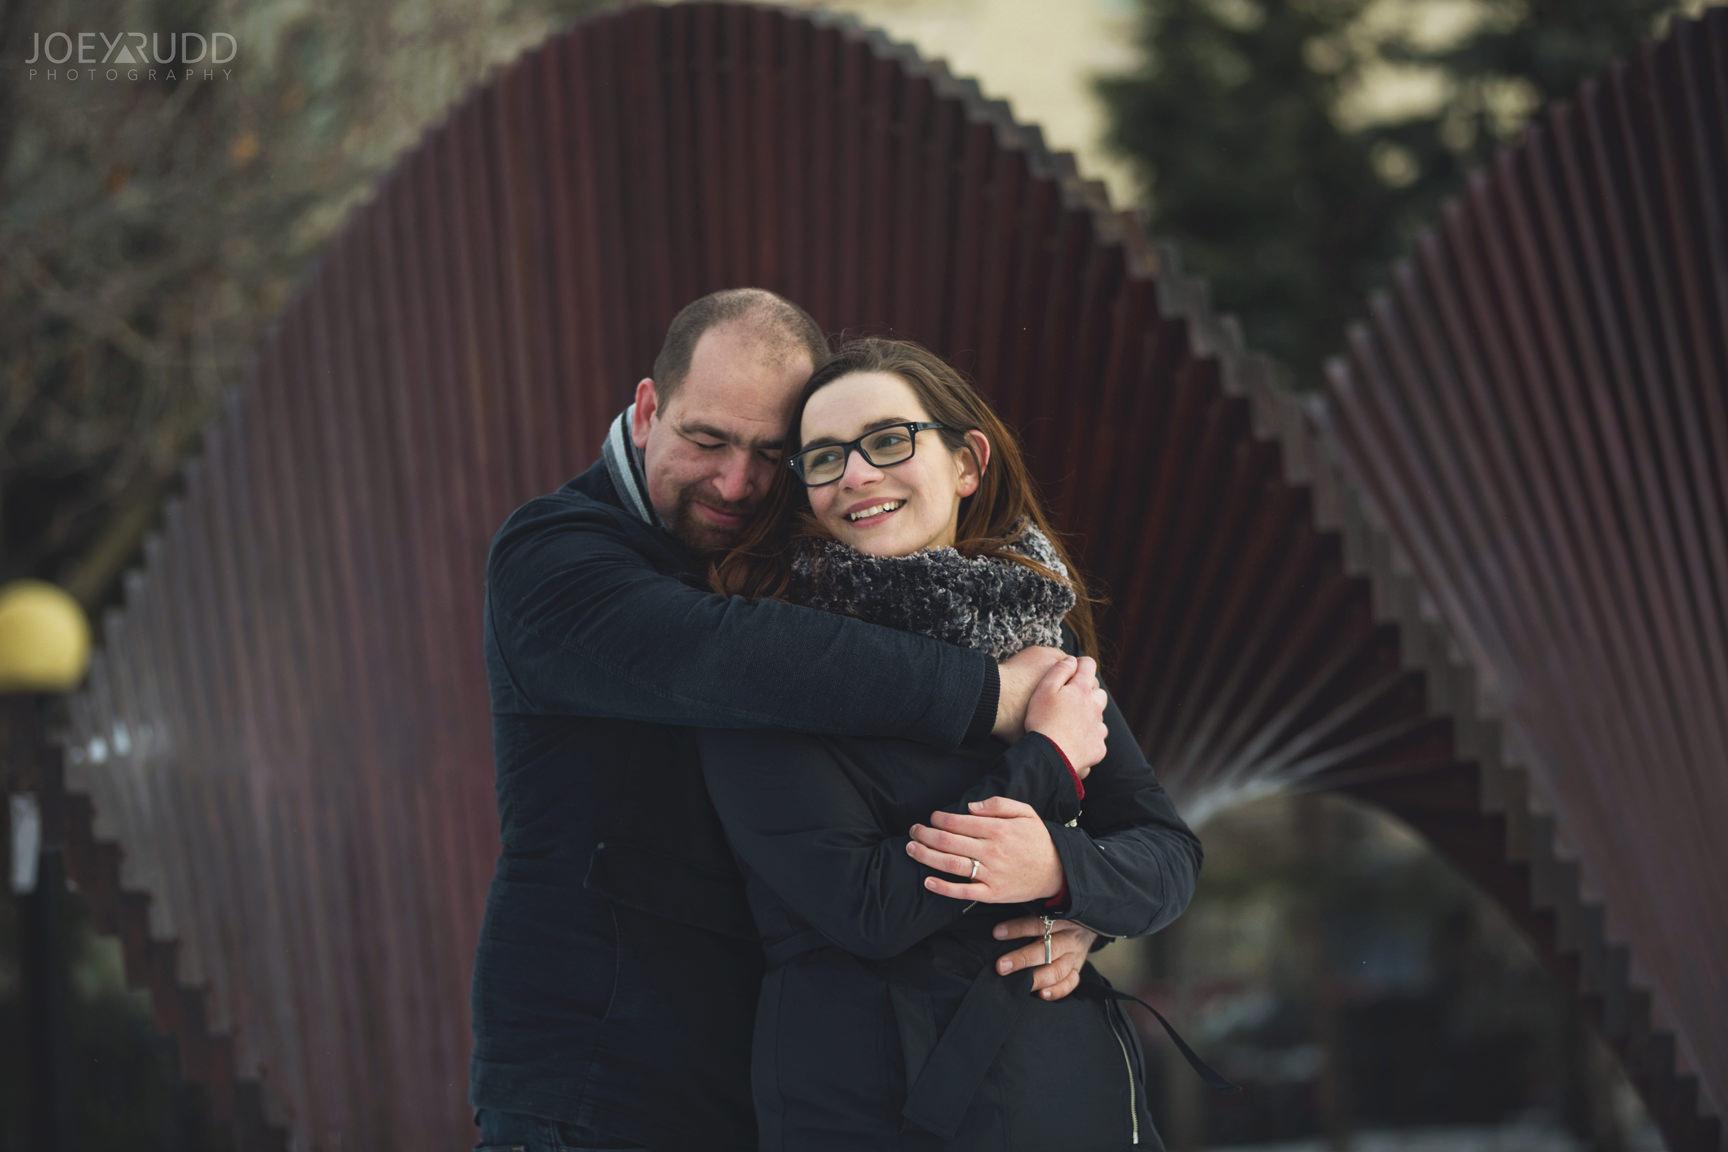 winter engagement at major's hill park by ottawa wedding photographer joey rudd photography modern art